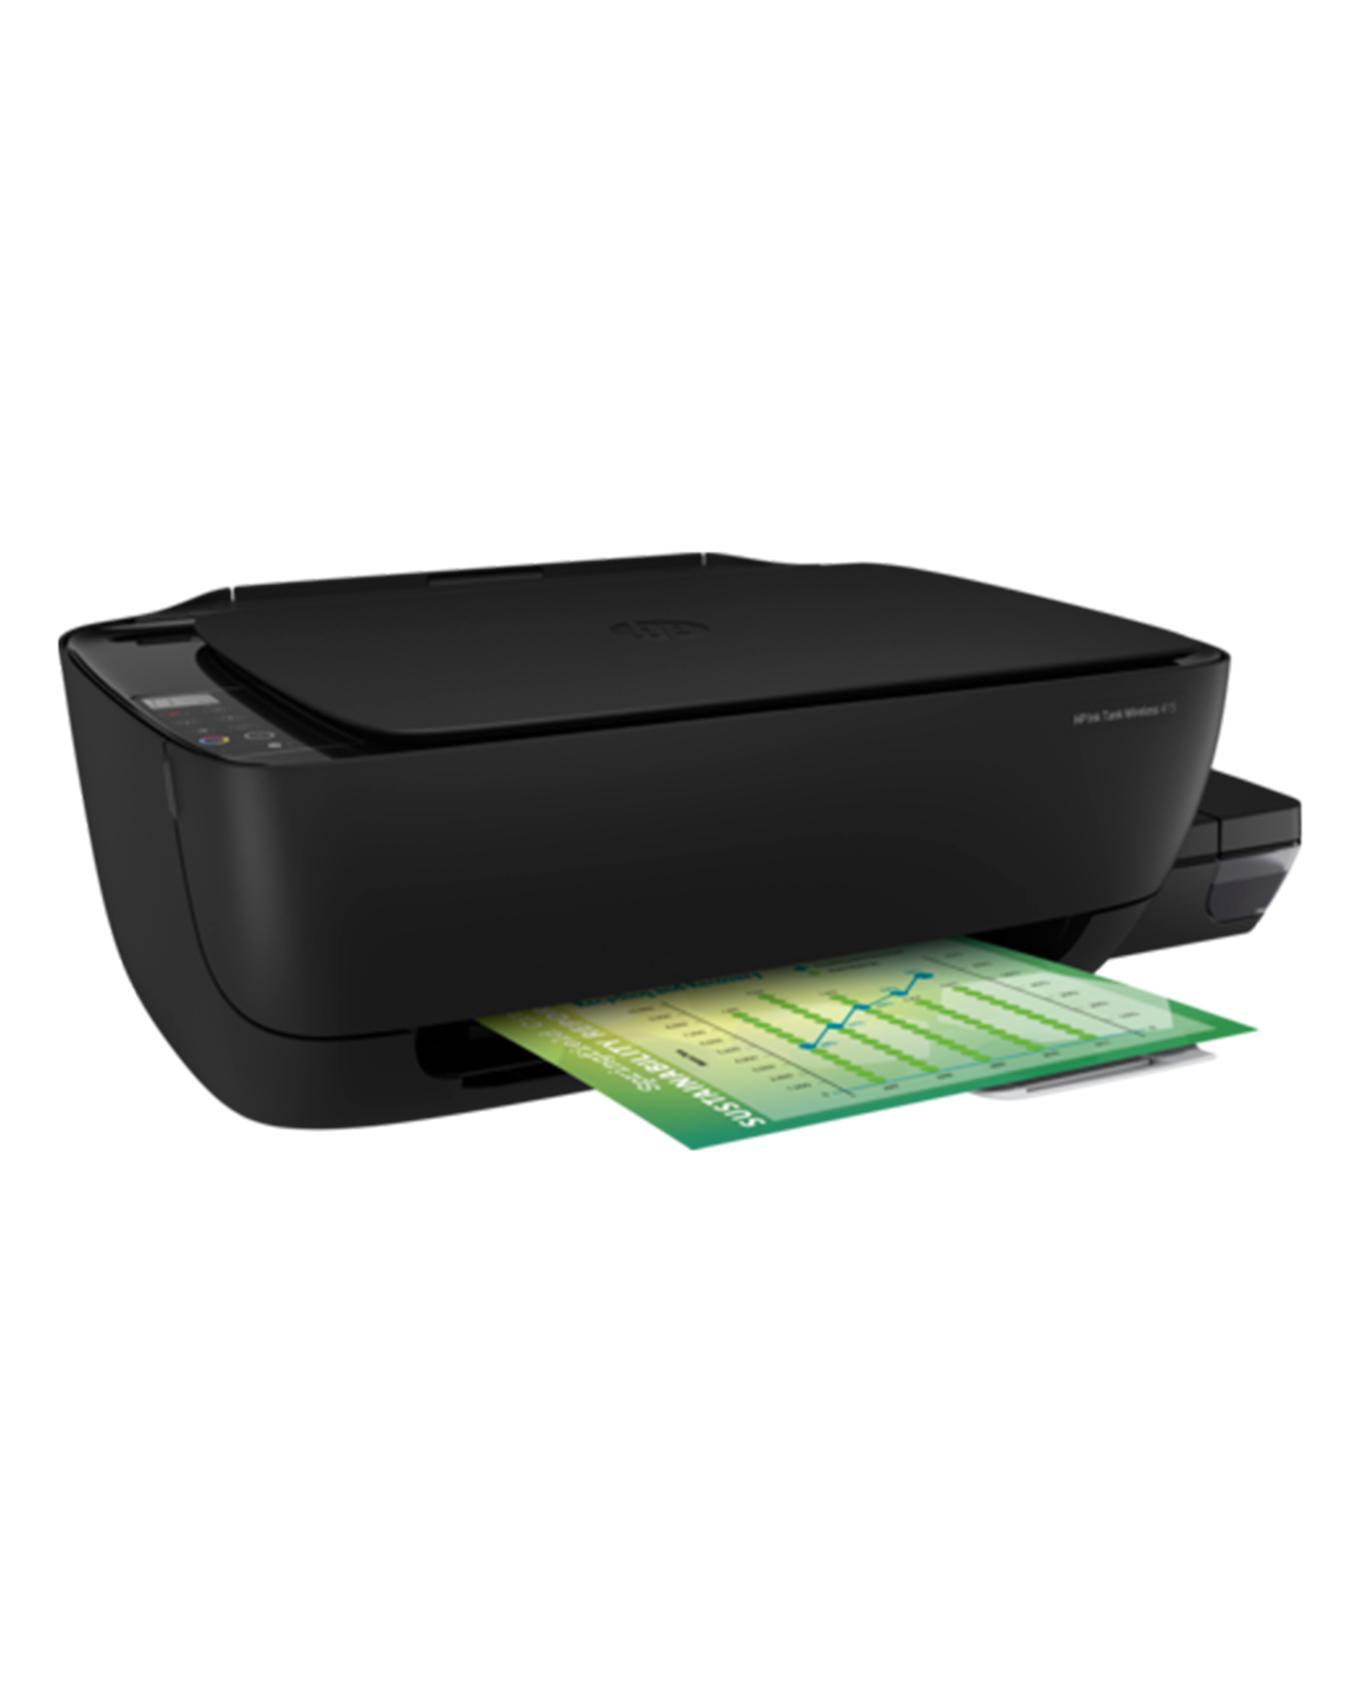 HP Ink AIO Printer Col Black TANK WL 415